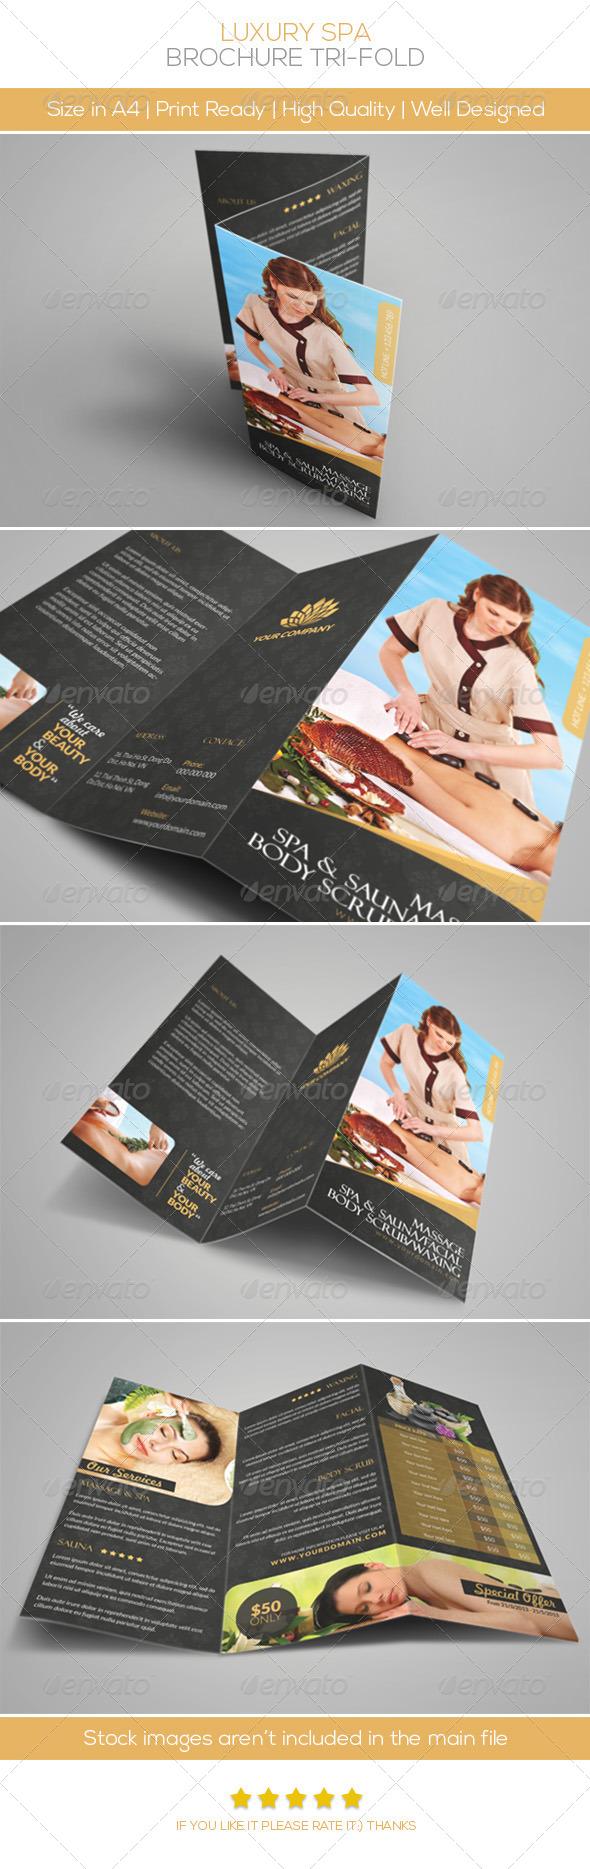 Luxury Spa Brochure Tri-fold - Brochures Print Templates